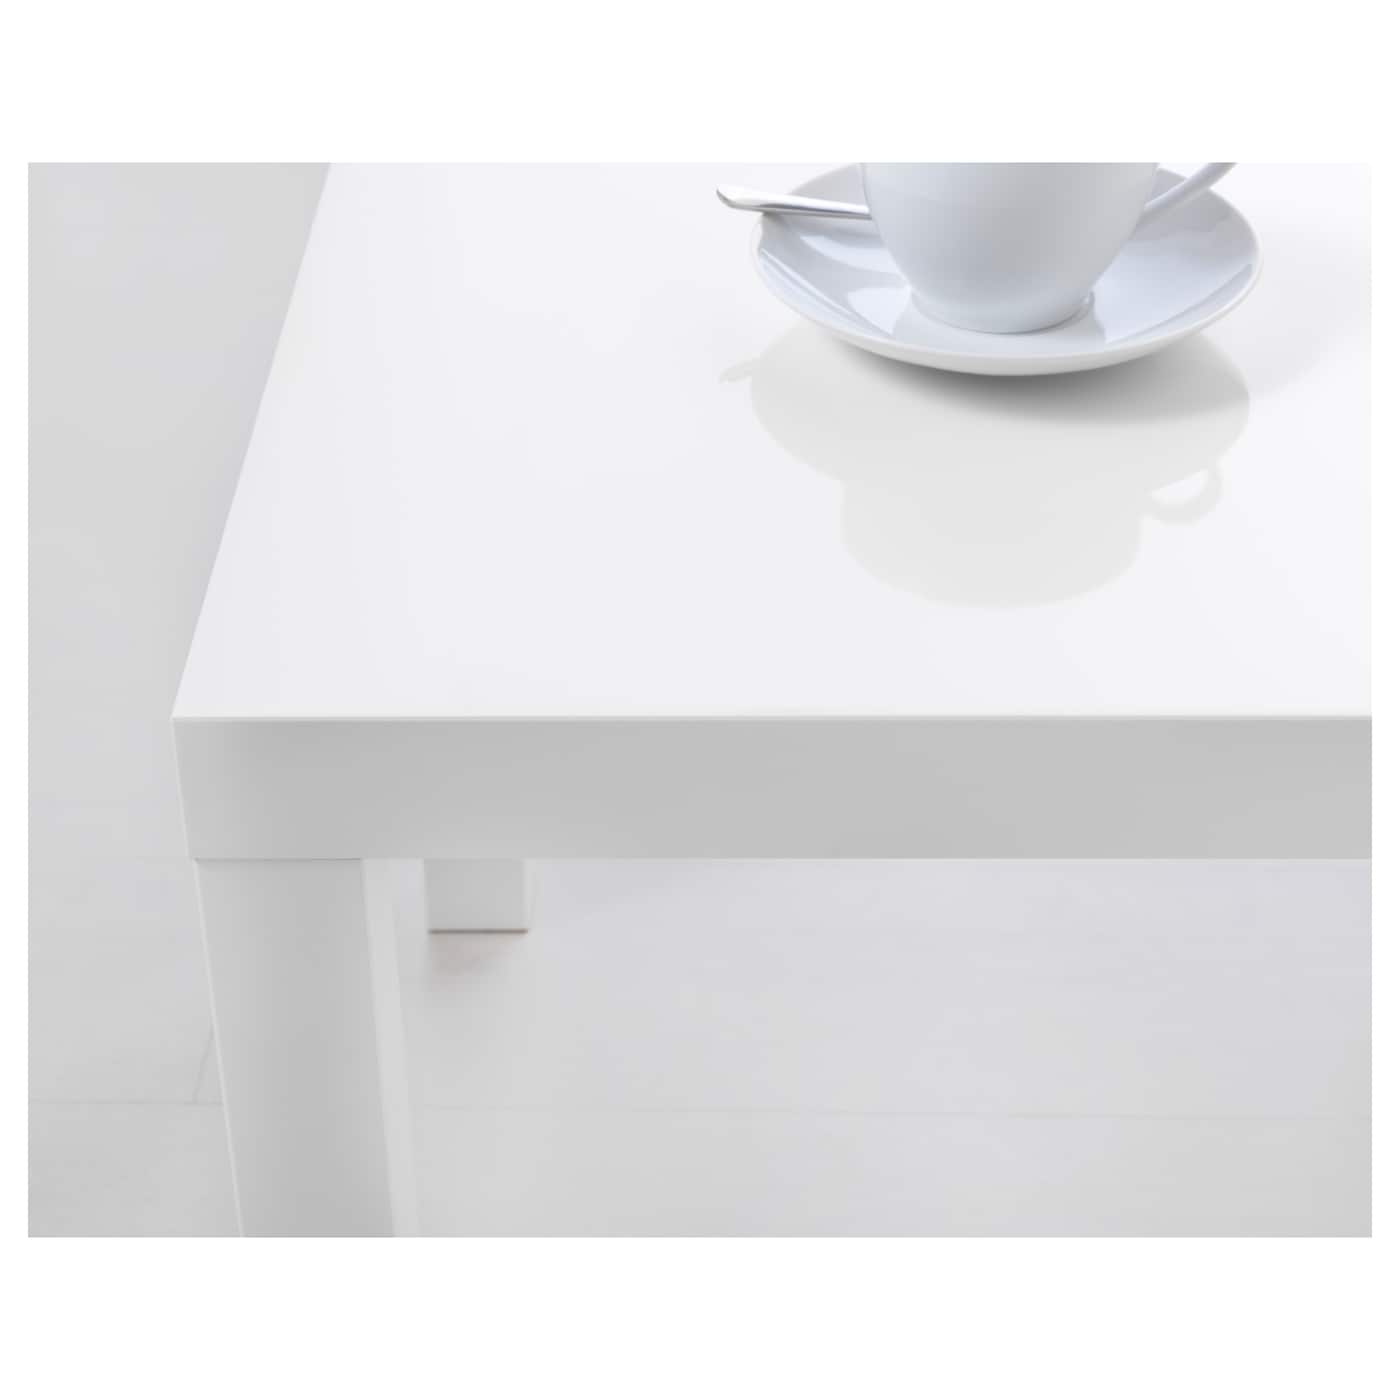 Annika White Gloss Coffee Table: LACK Side Table High-gloss White 55 X 55 Cm